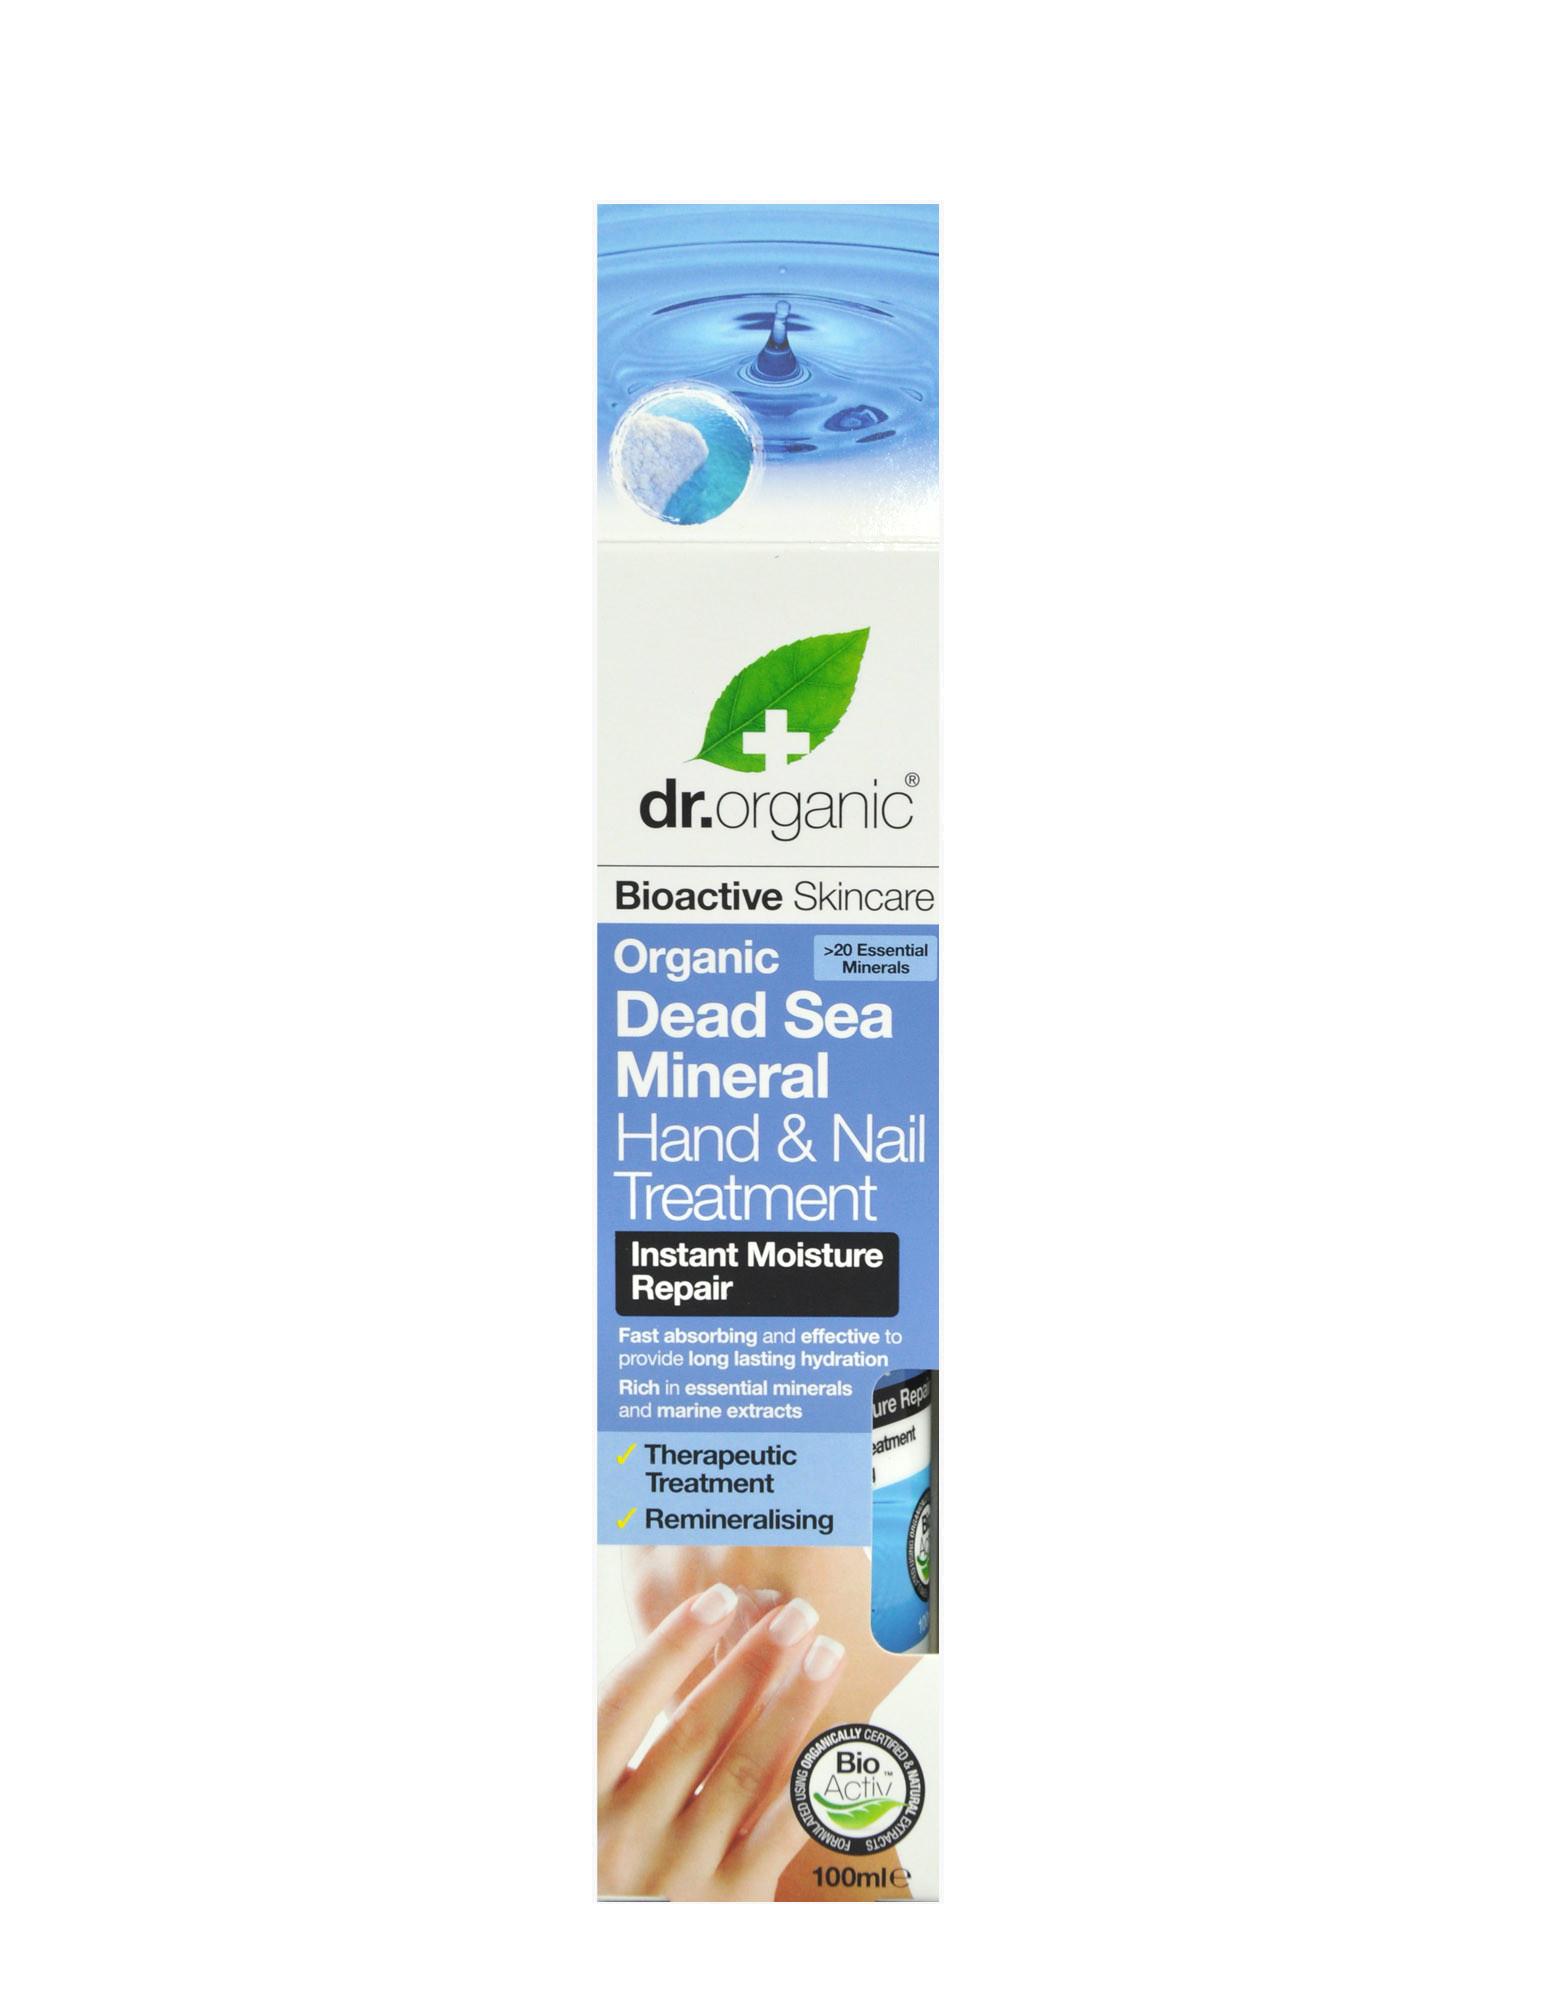 Organic Dead Sea Mineral - Hand & Nail Treatment by DR. ORGANIC ...